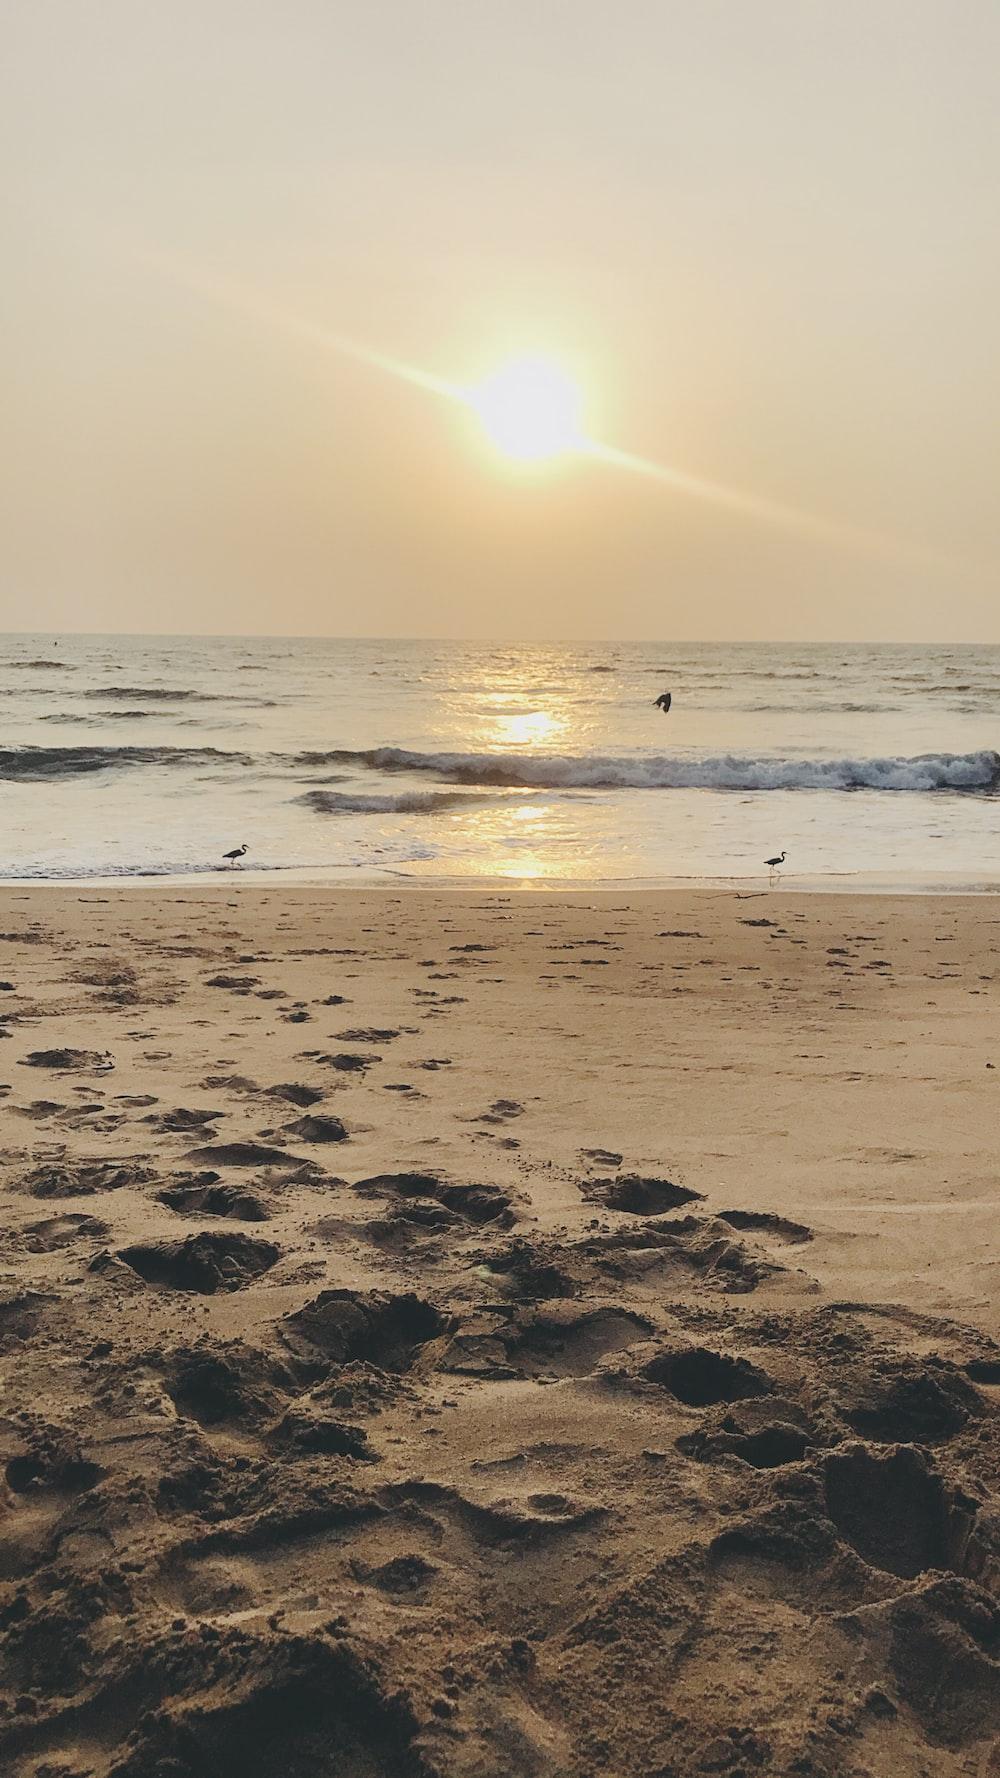 sun view on beach